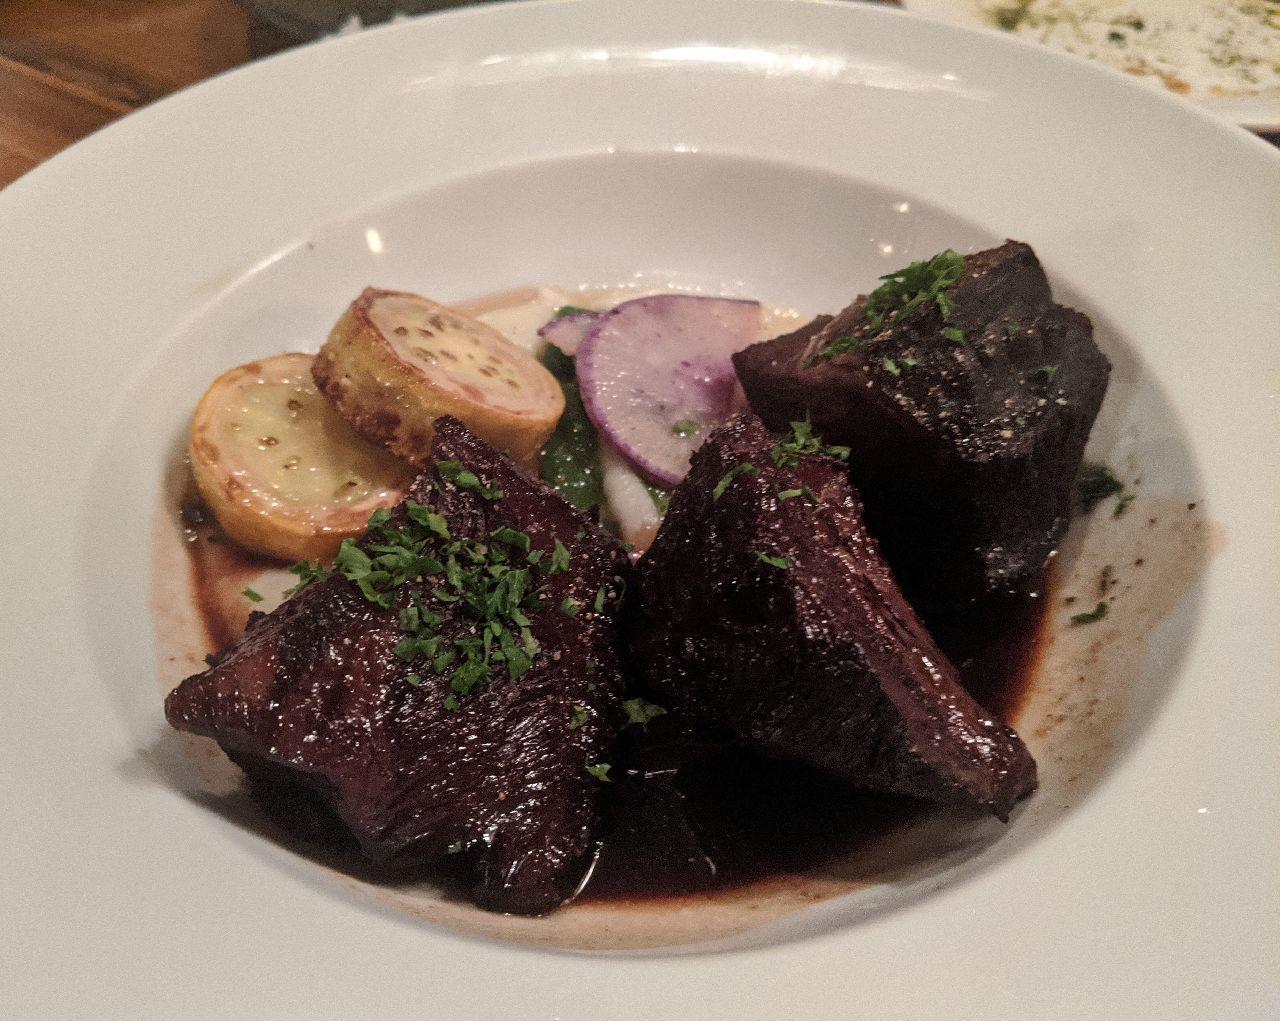 MVIMG_20200715_211712牛ホホ肉の赤ワイン煮